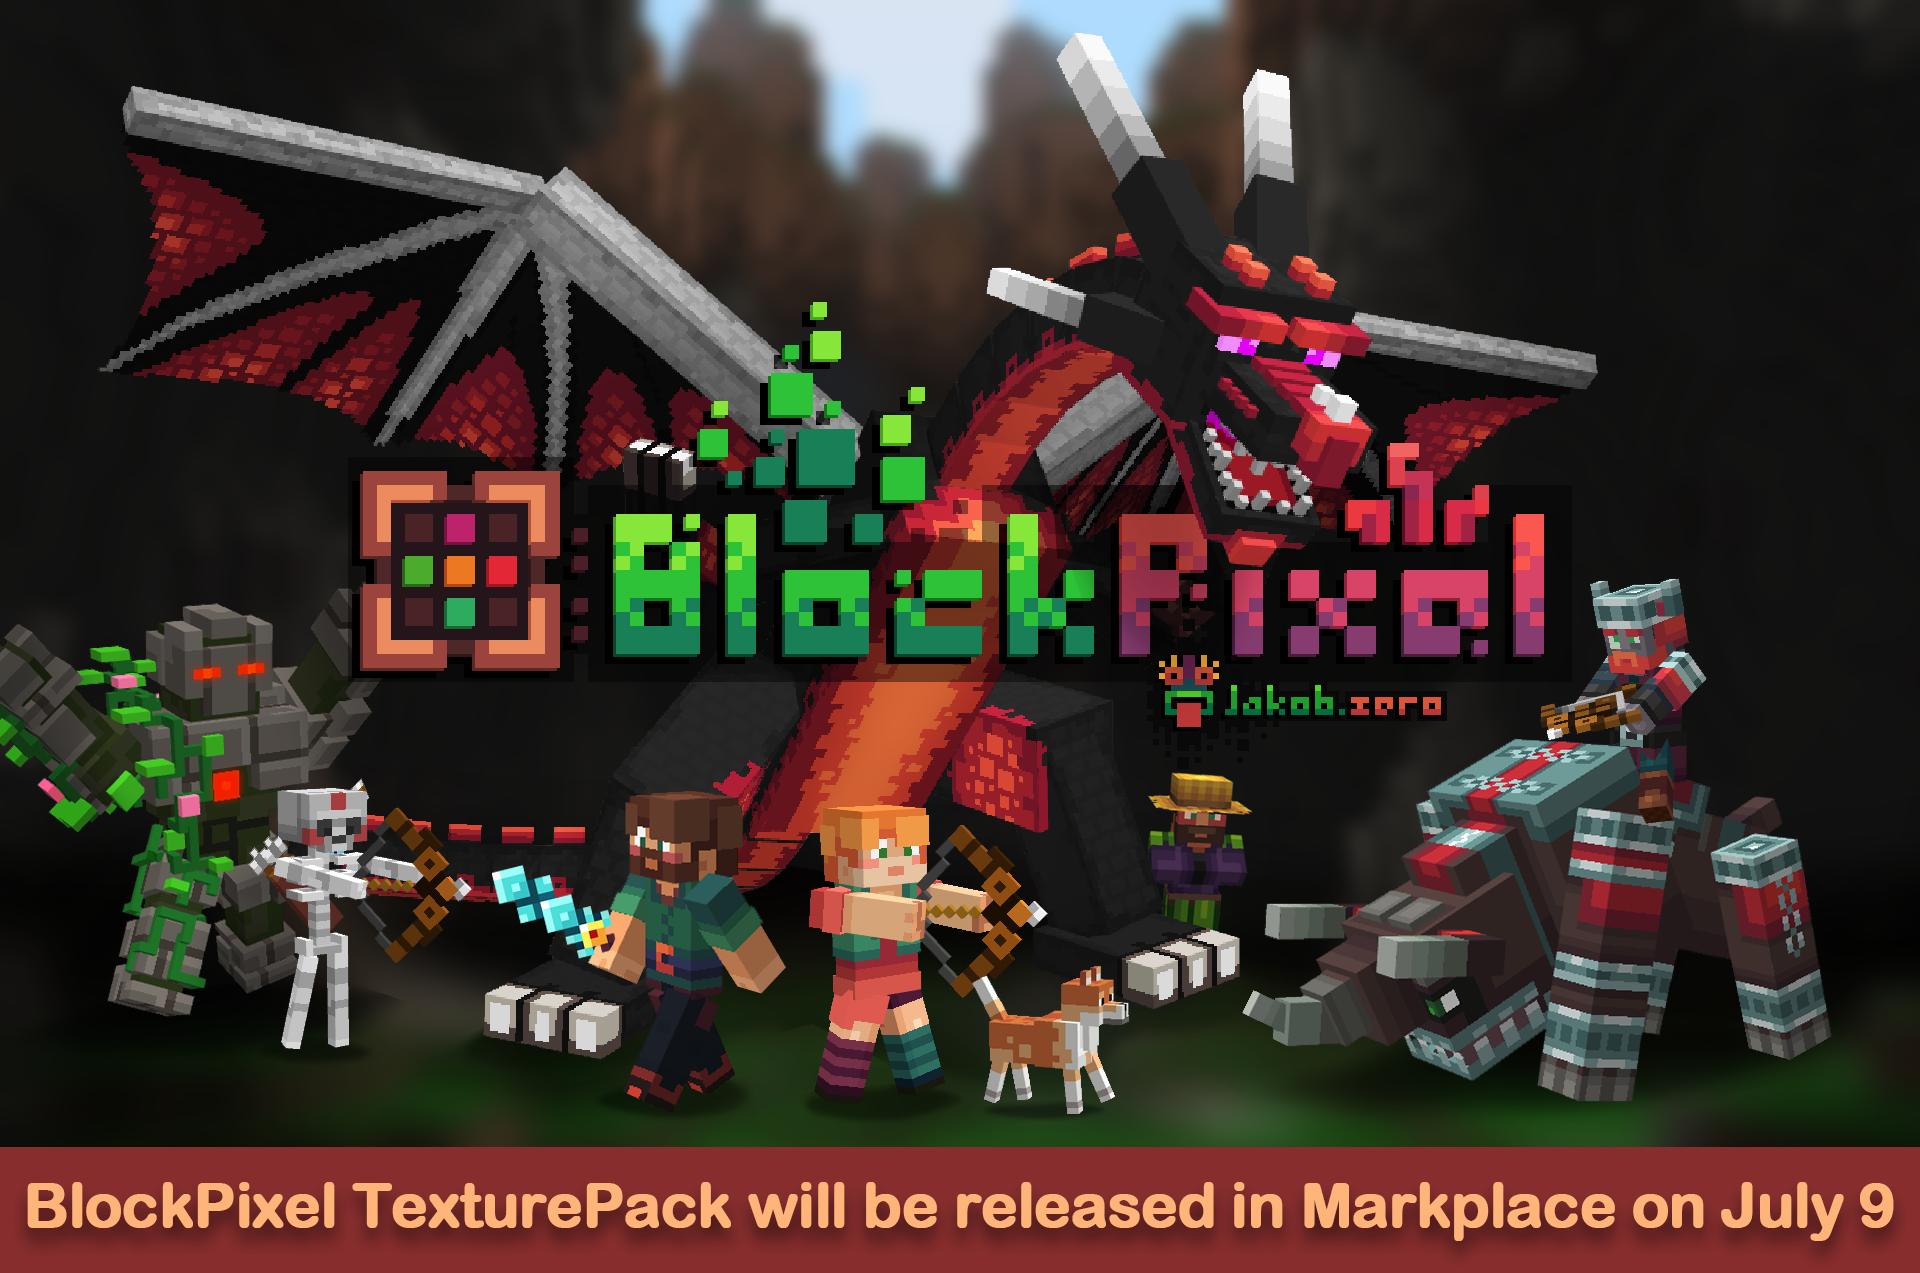 BlockPixel